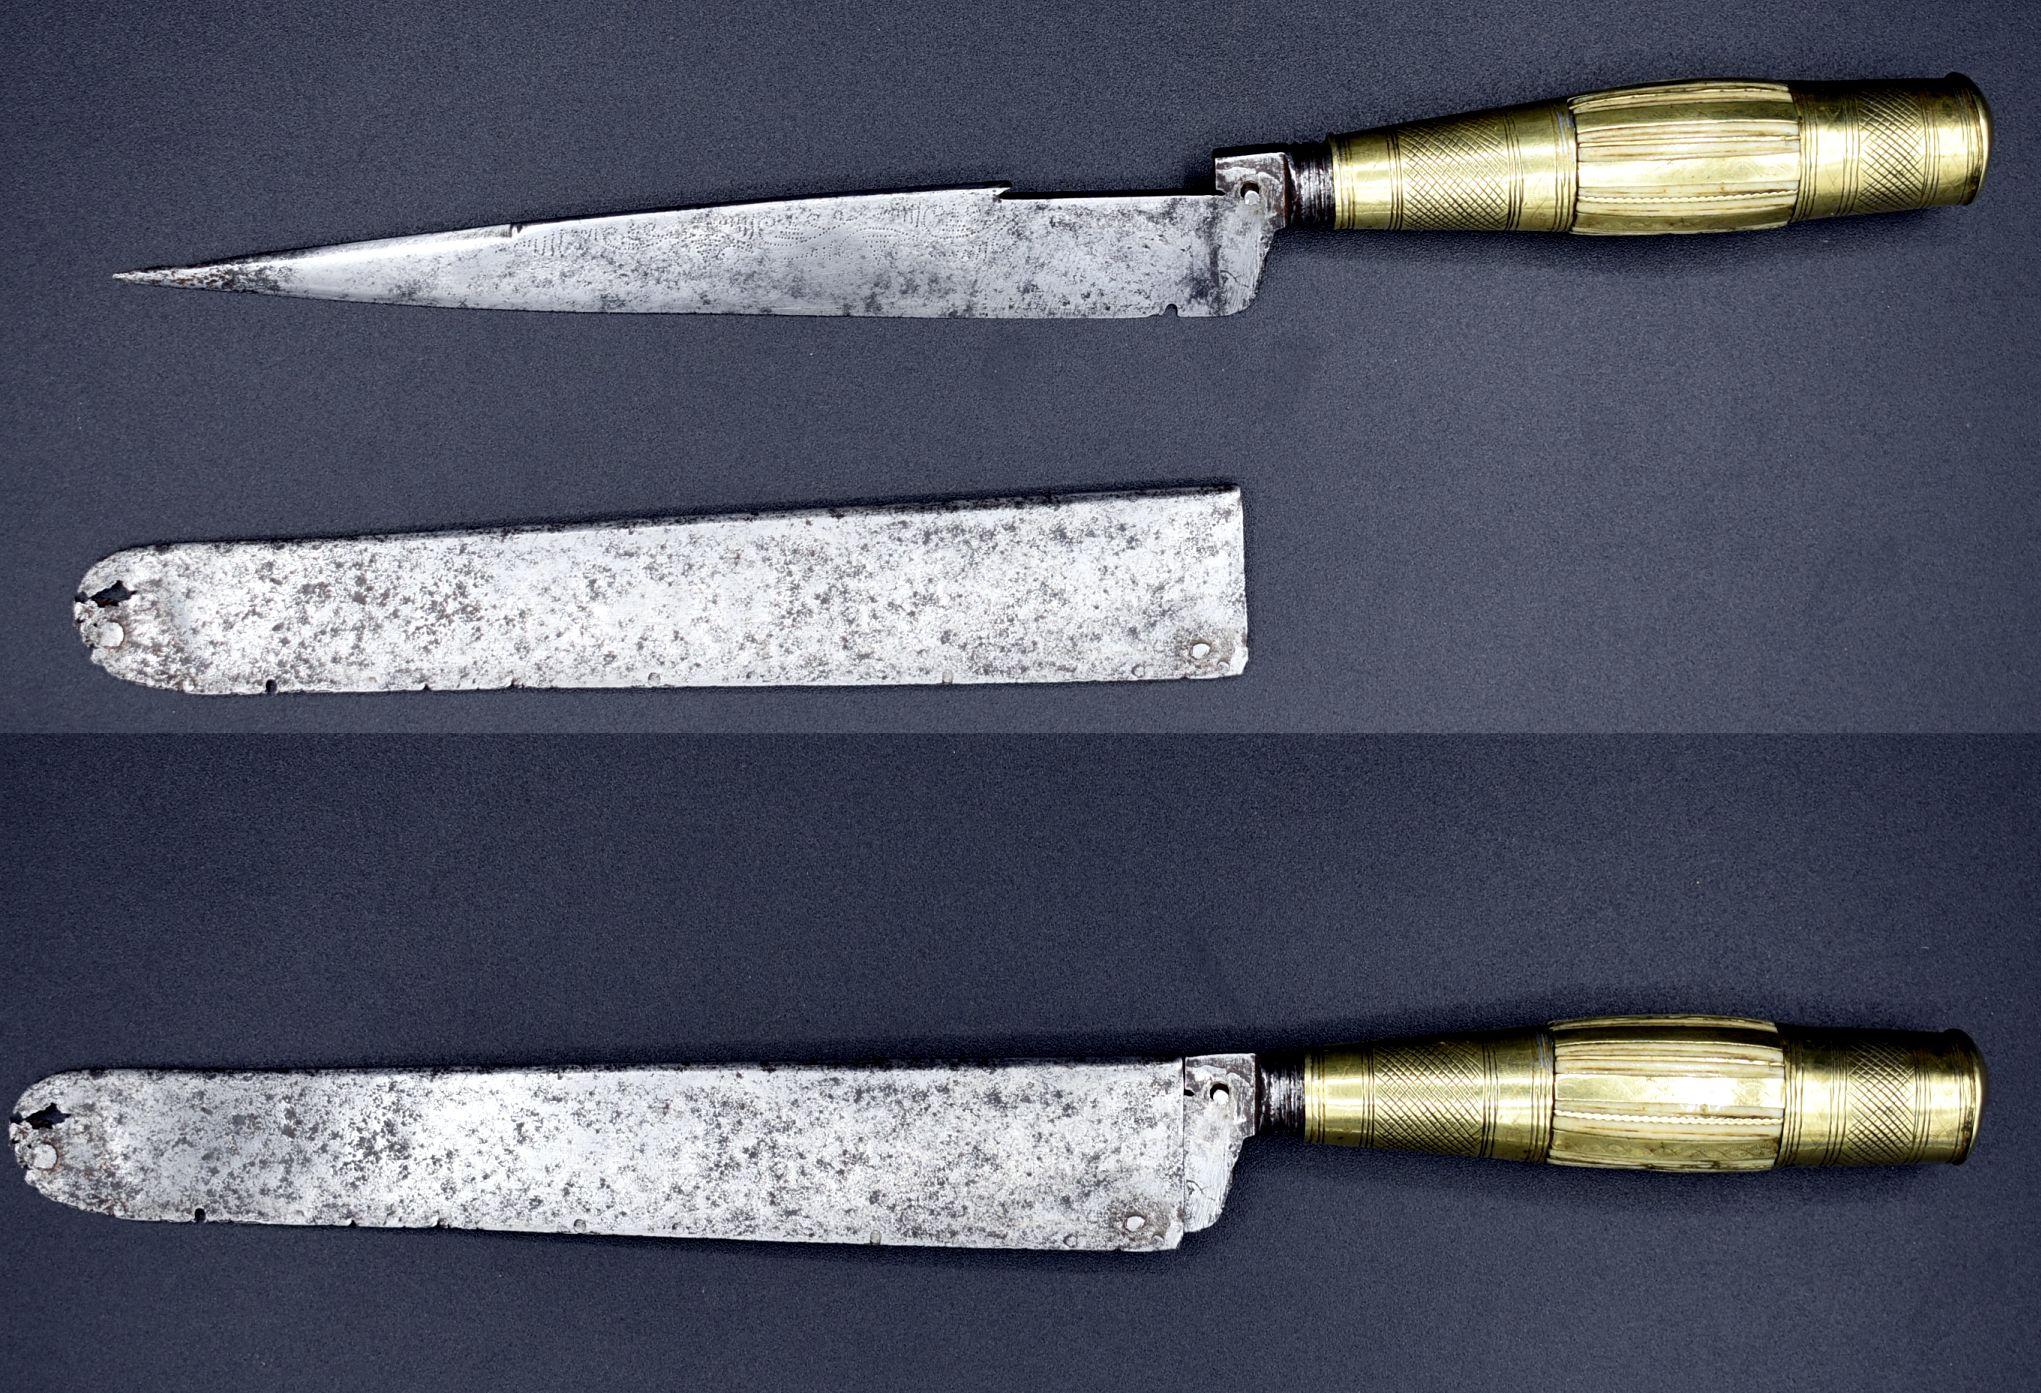 cuchillo filo de secreto vaina acero